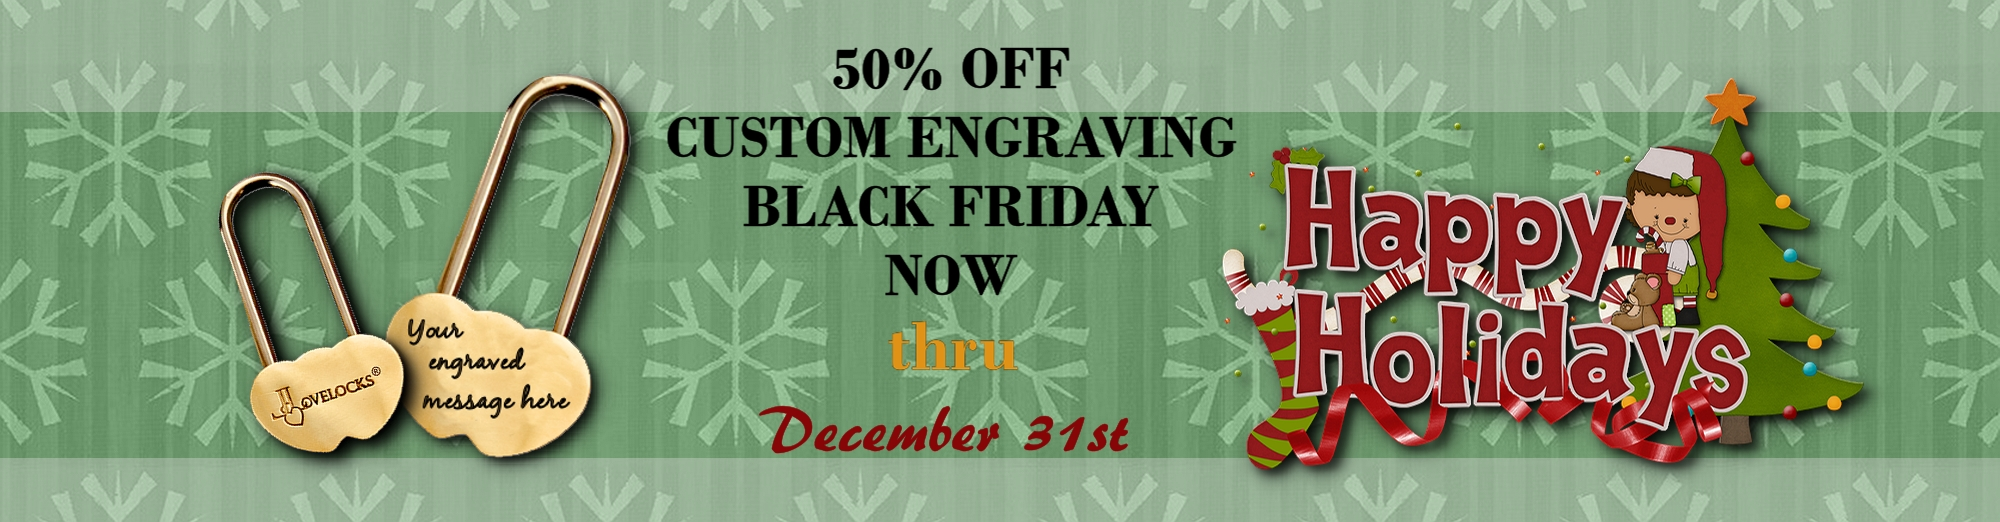 50% Off Custom Engraving